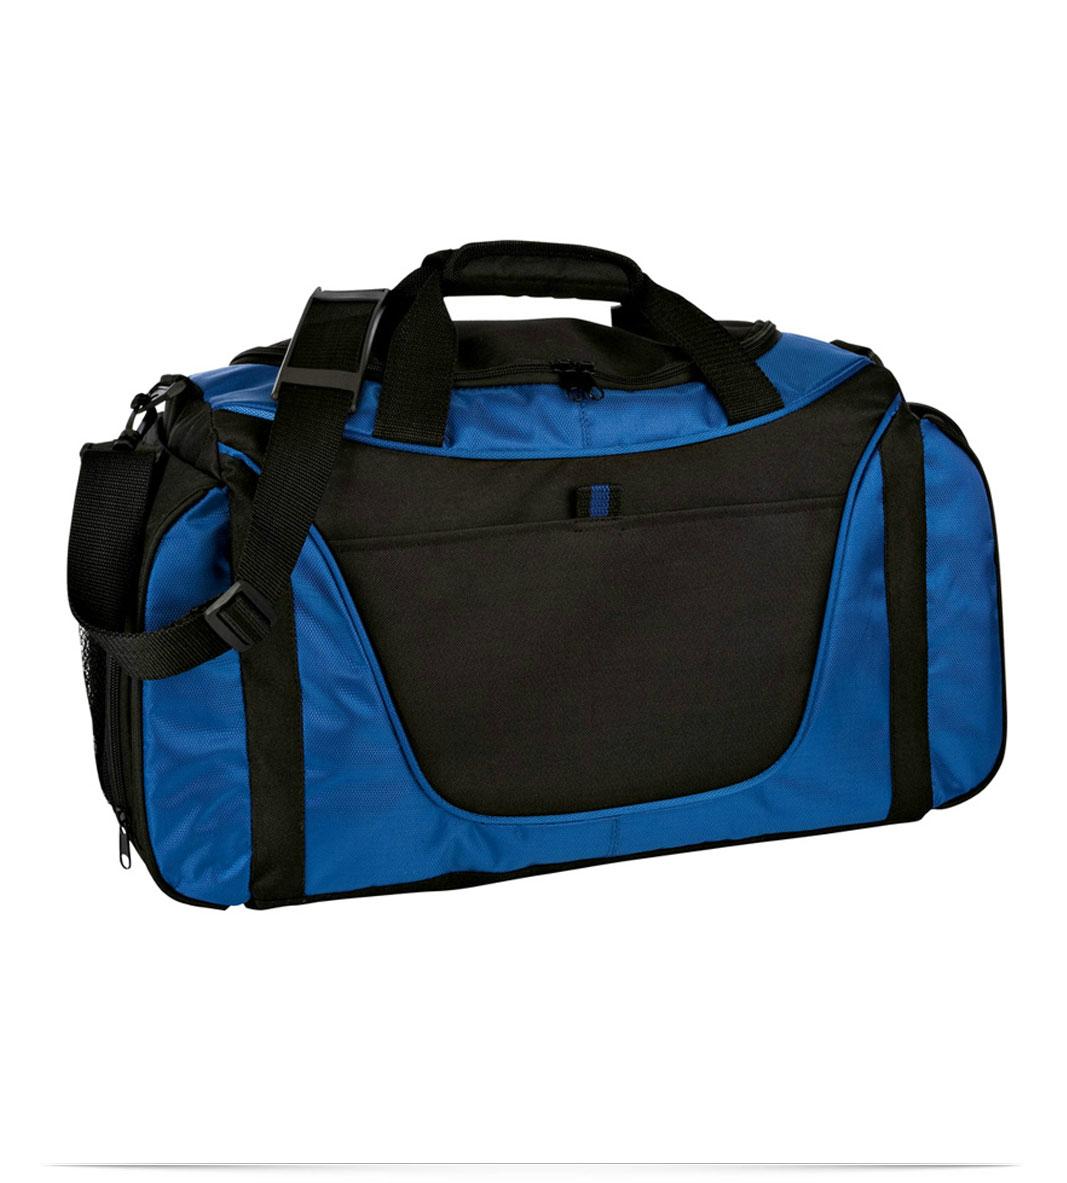 a8bddfdf7f1a Design Embroidered Two-Tone Duffel Bag Online at AllStar Logo